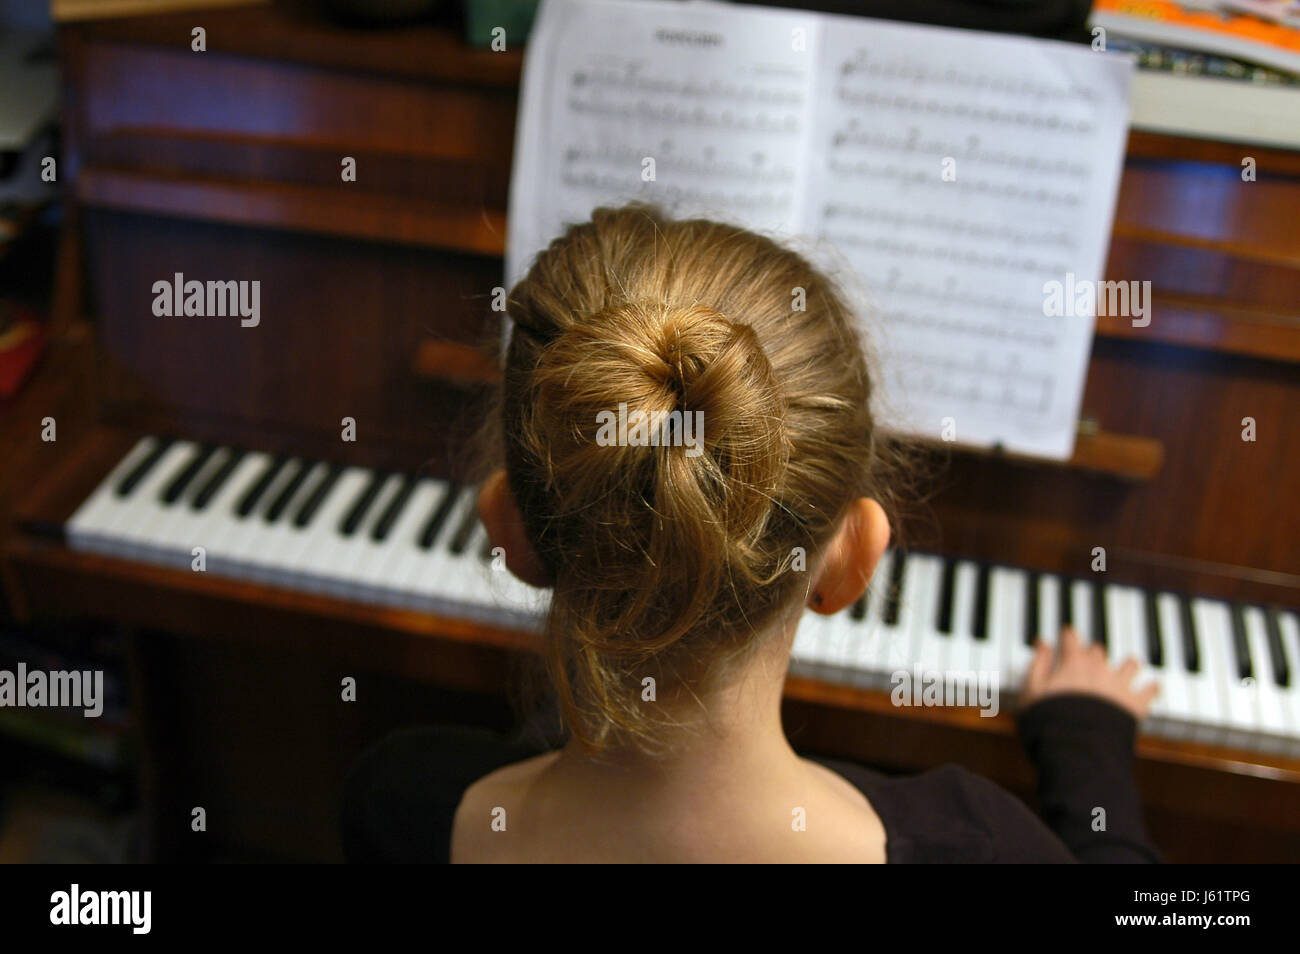 piano teacher - Stock Image